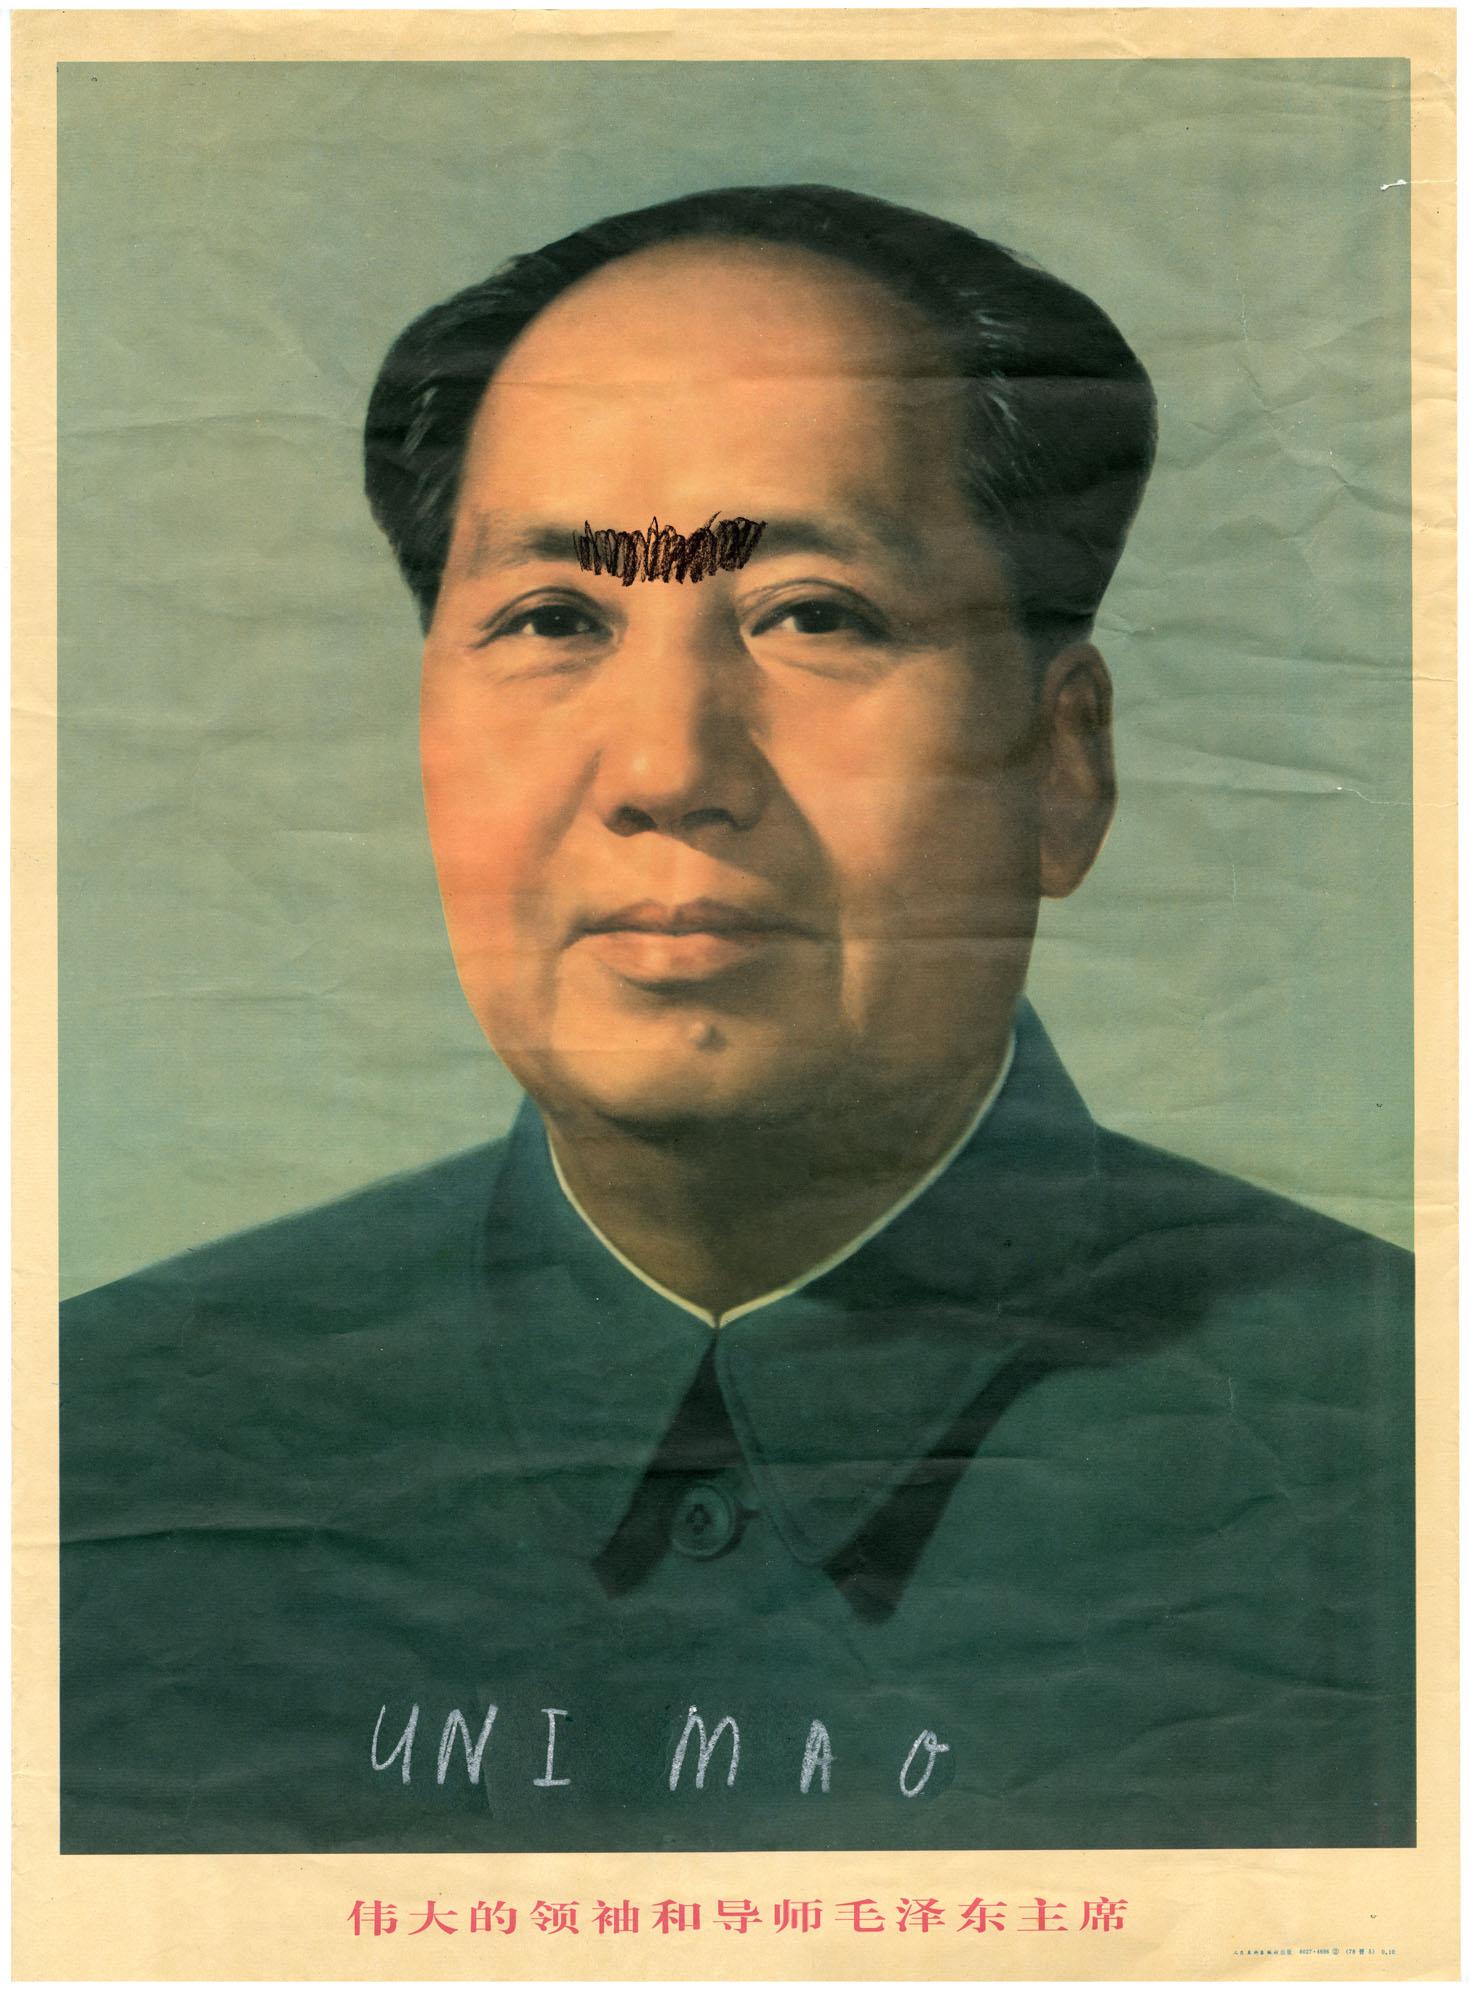 Uni Mao, 2012